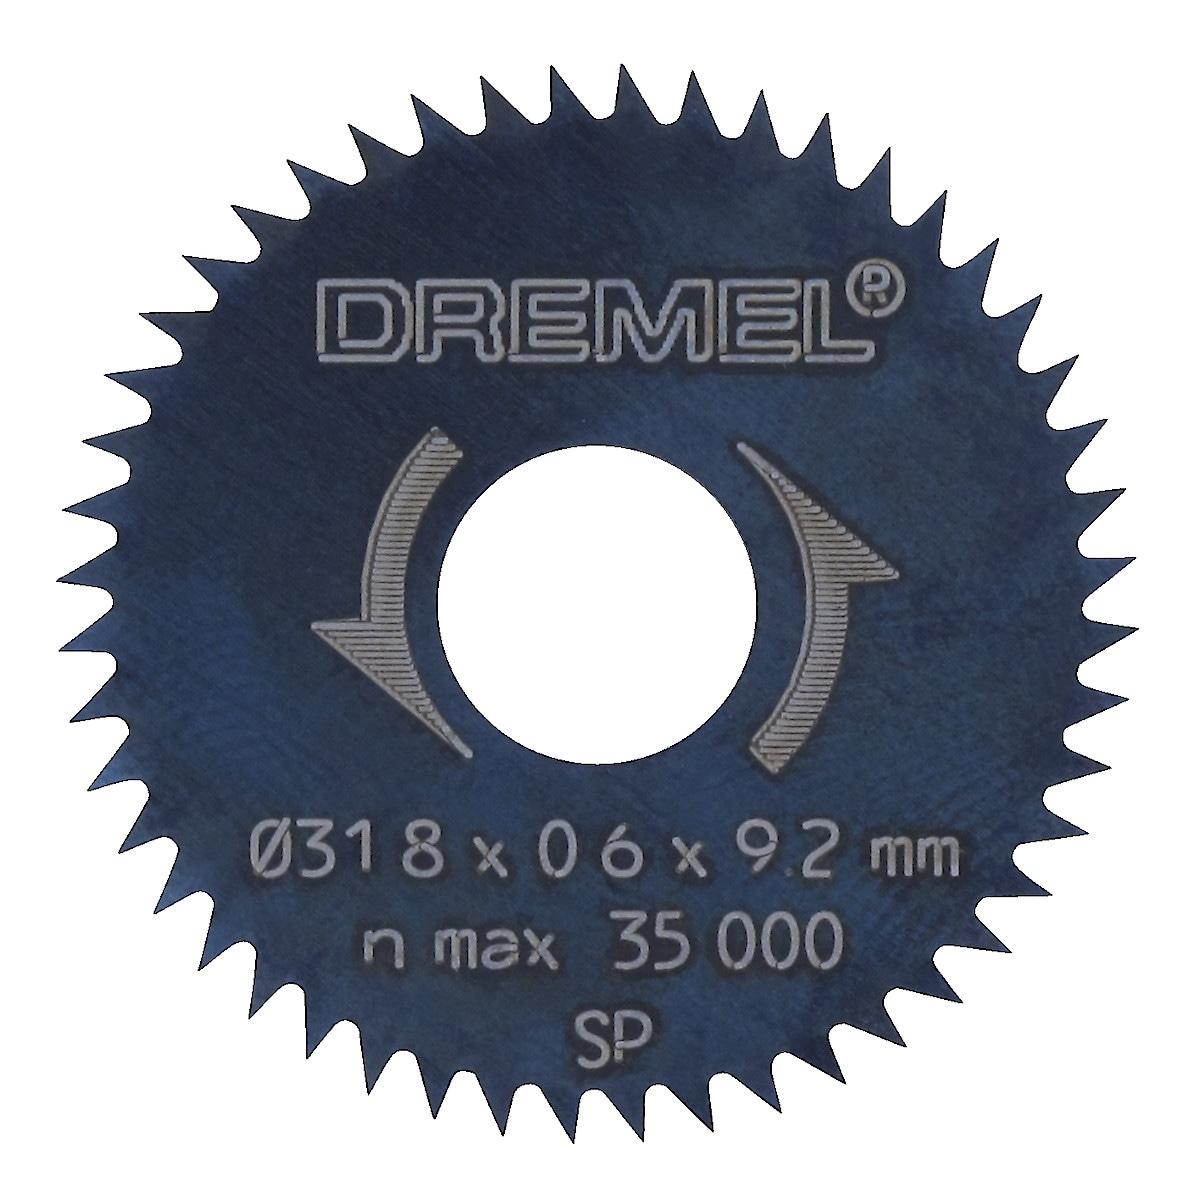 Sågklinga Dremel 546